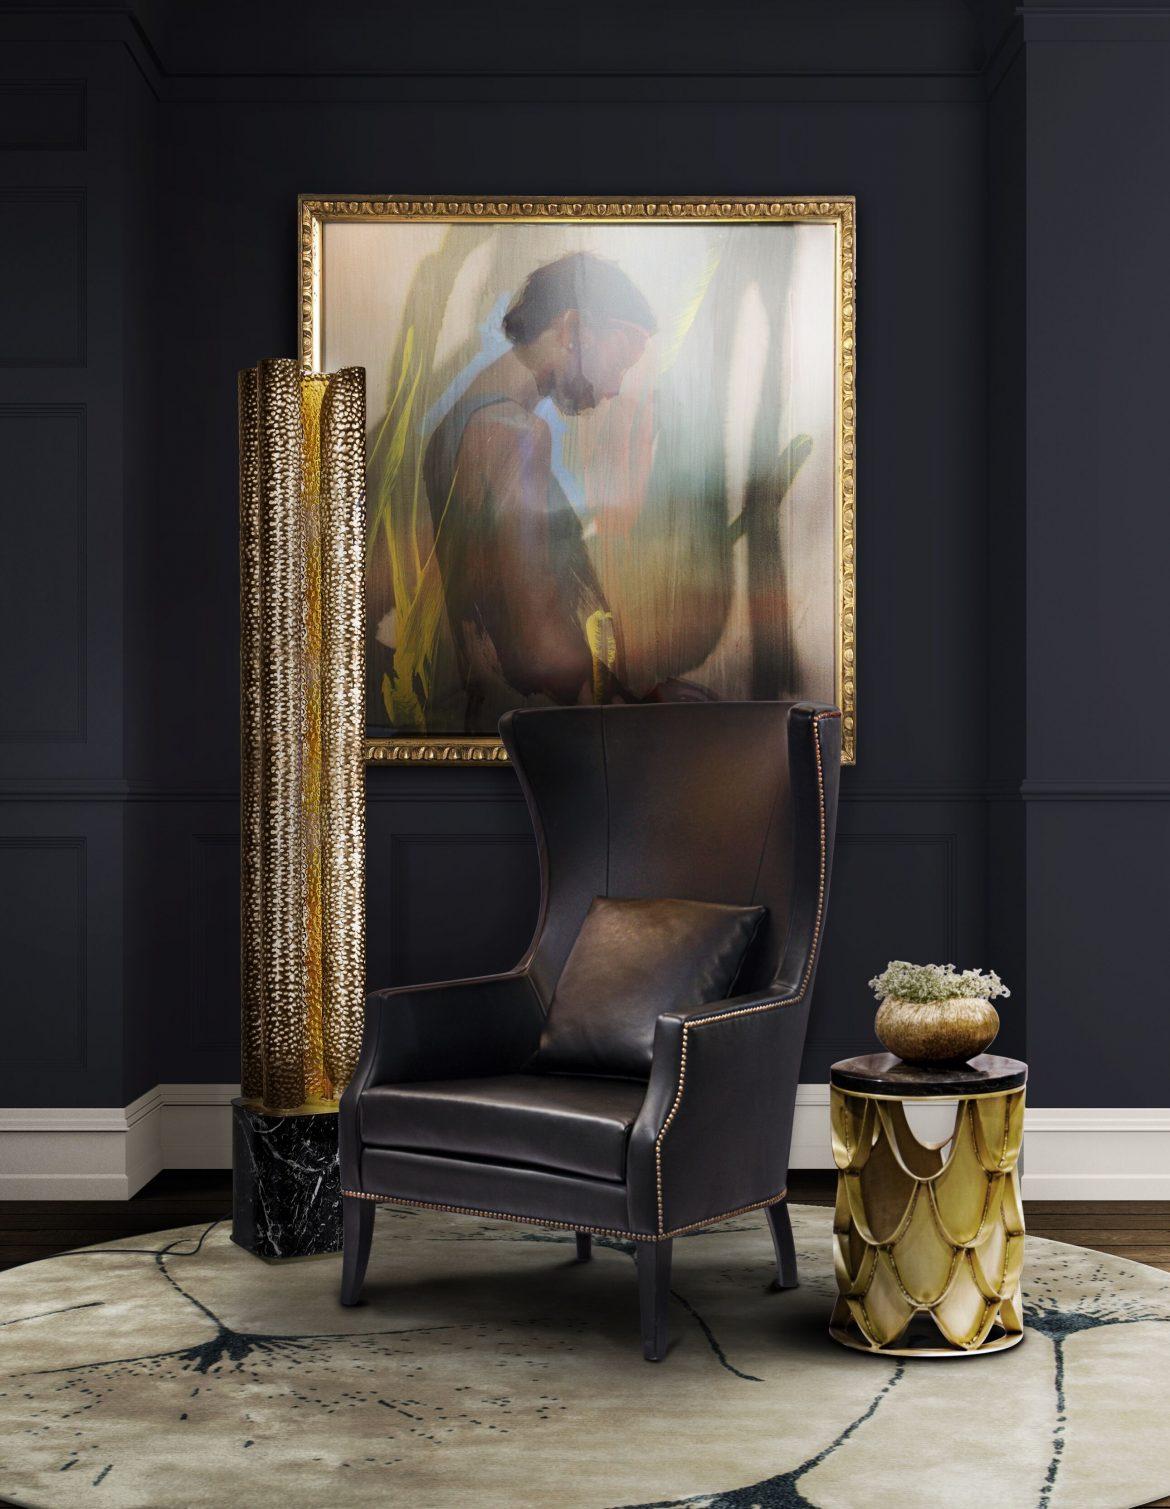 30 Best Living Room Ideas For 2020 living room ideas 30 Best Living Room Ideas For 2020 best living room ideas 2020 2